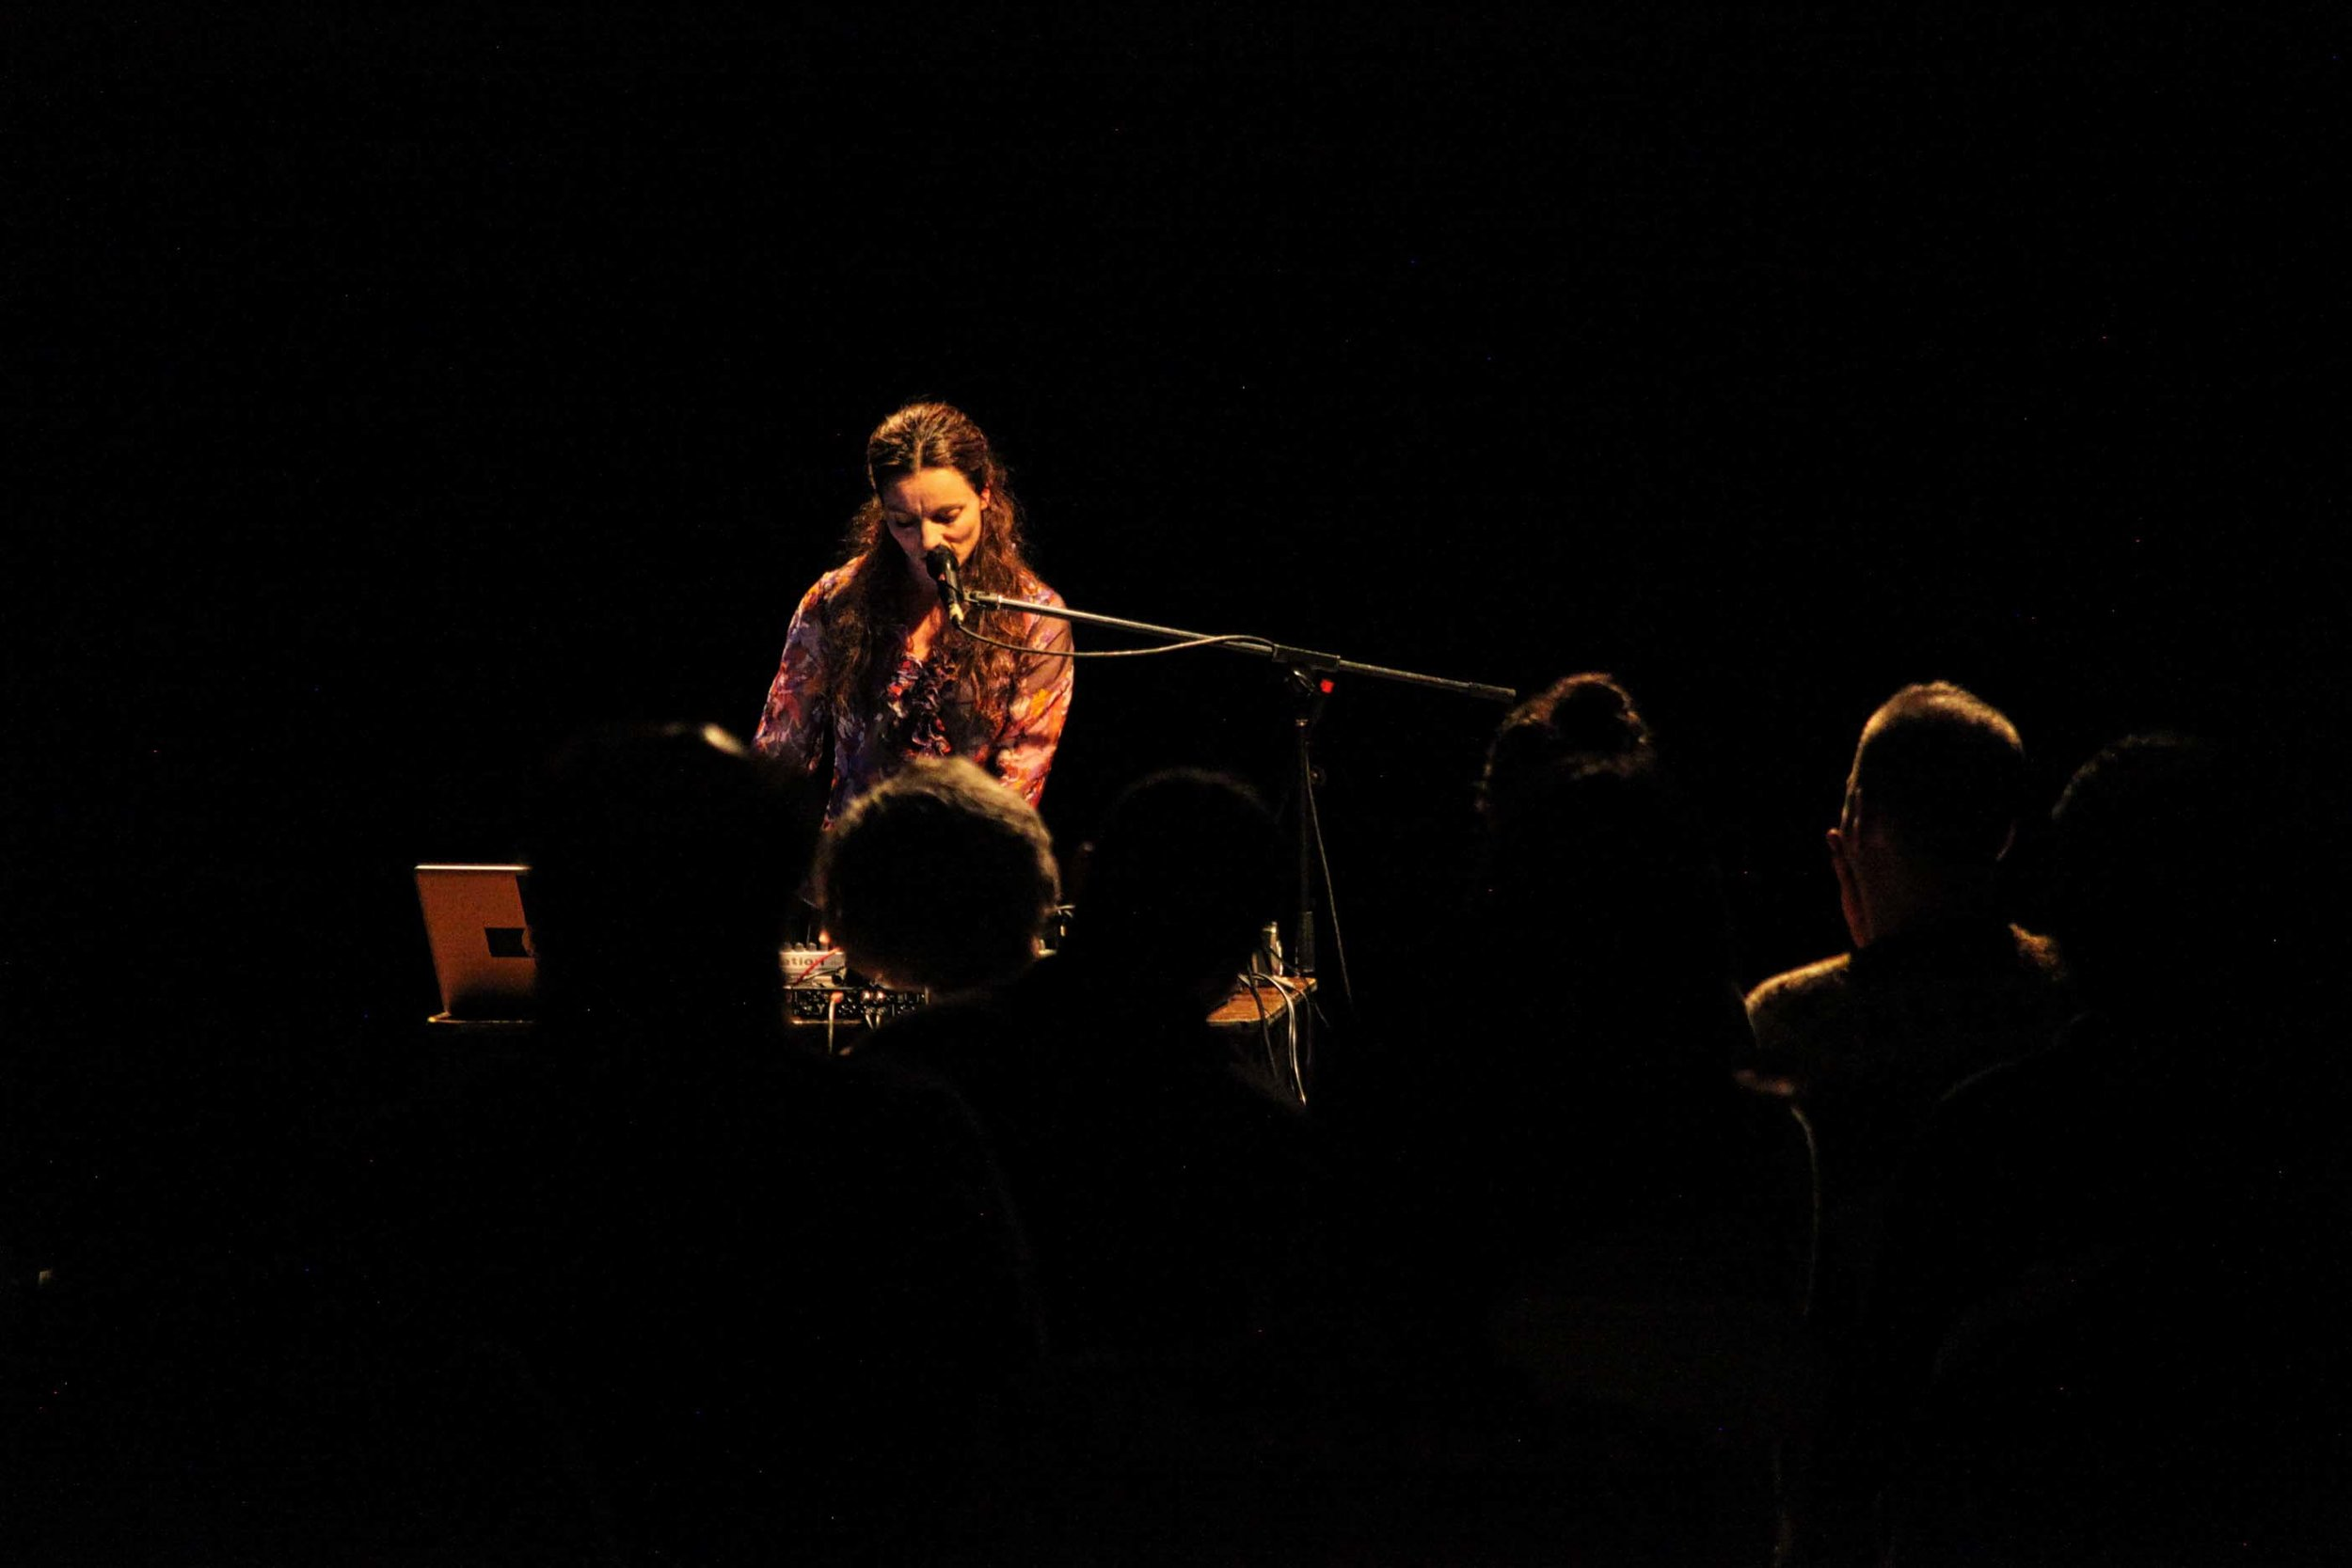 Maja Ratkje. Constellation, Chicago, 2013.